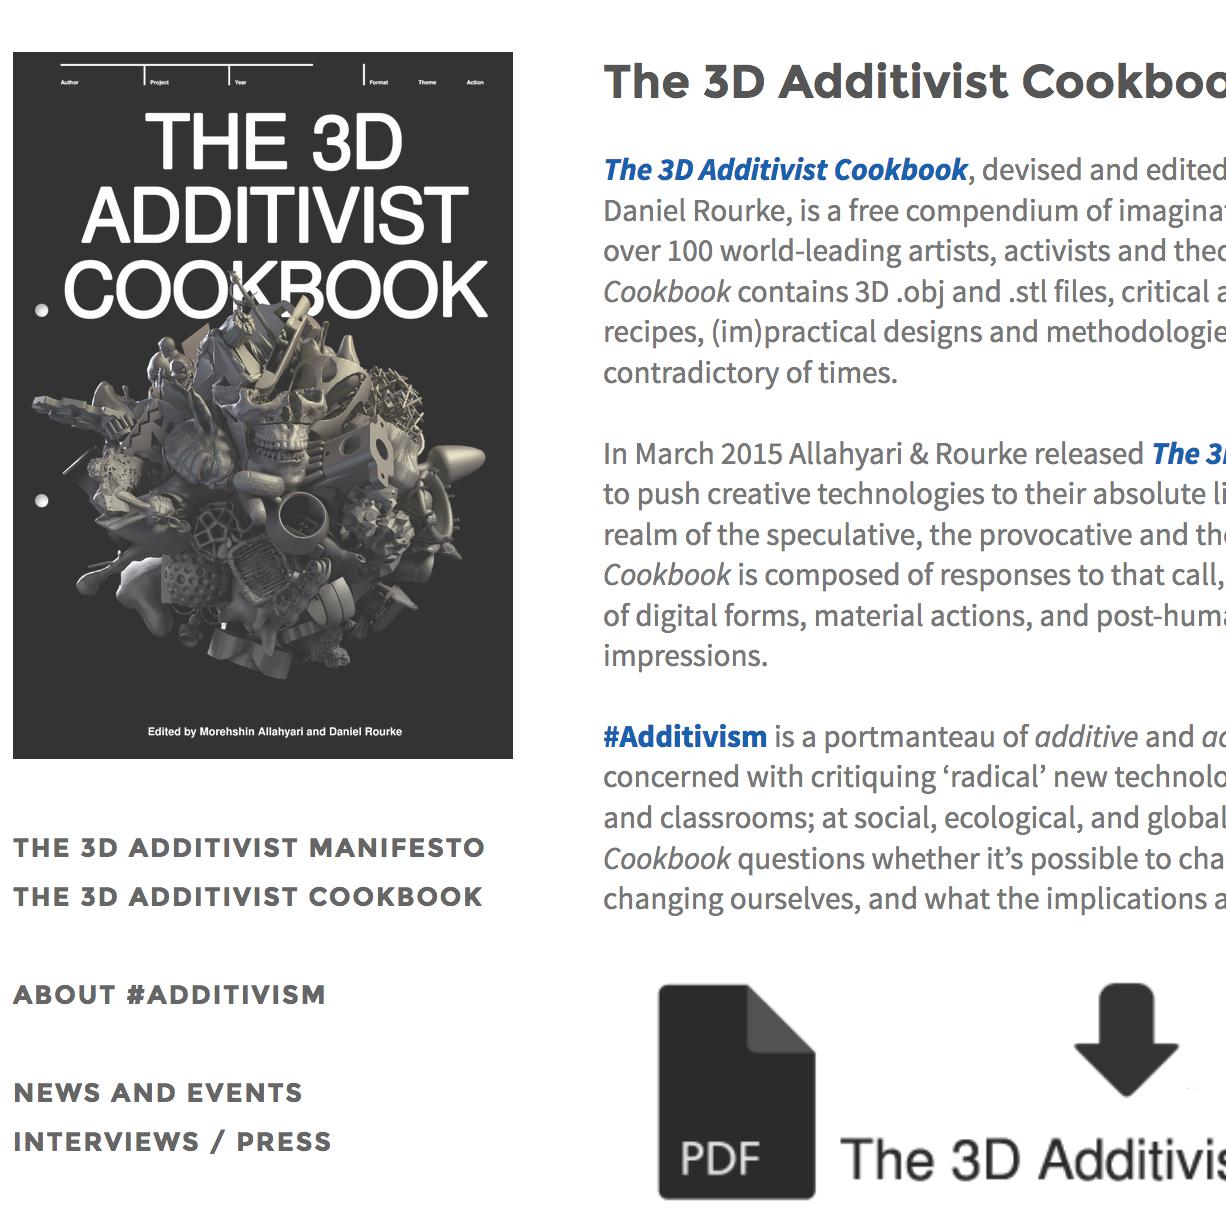 2016: 3D Additivist Cookbook